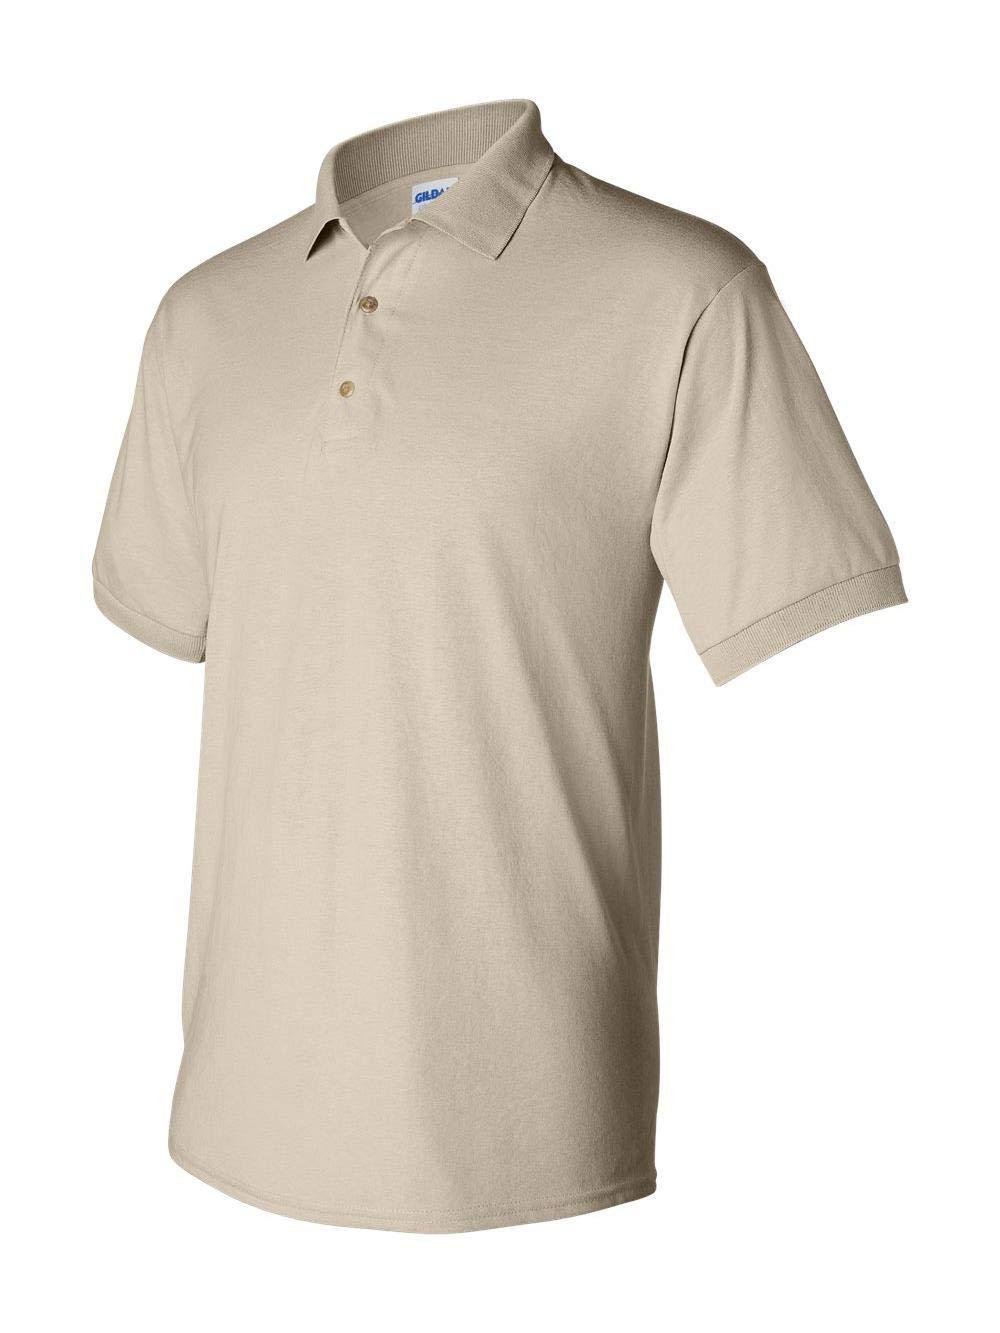 Gildan mens DryBlend 6 oz. 50/50 Jersey